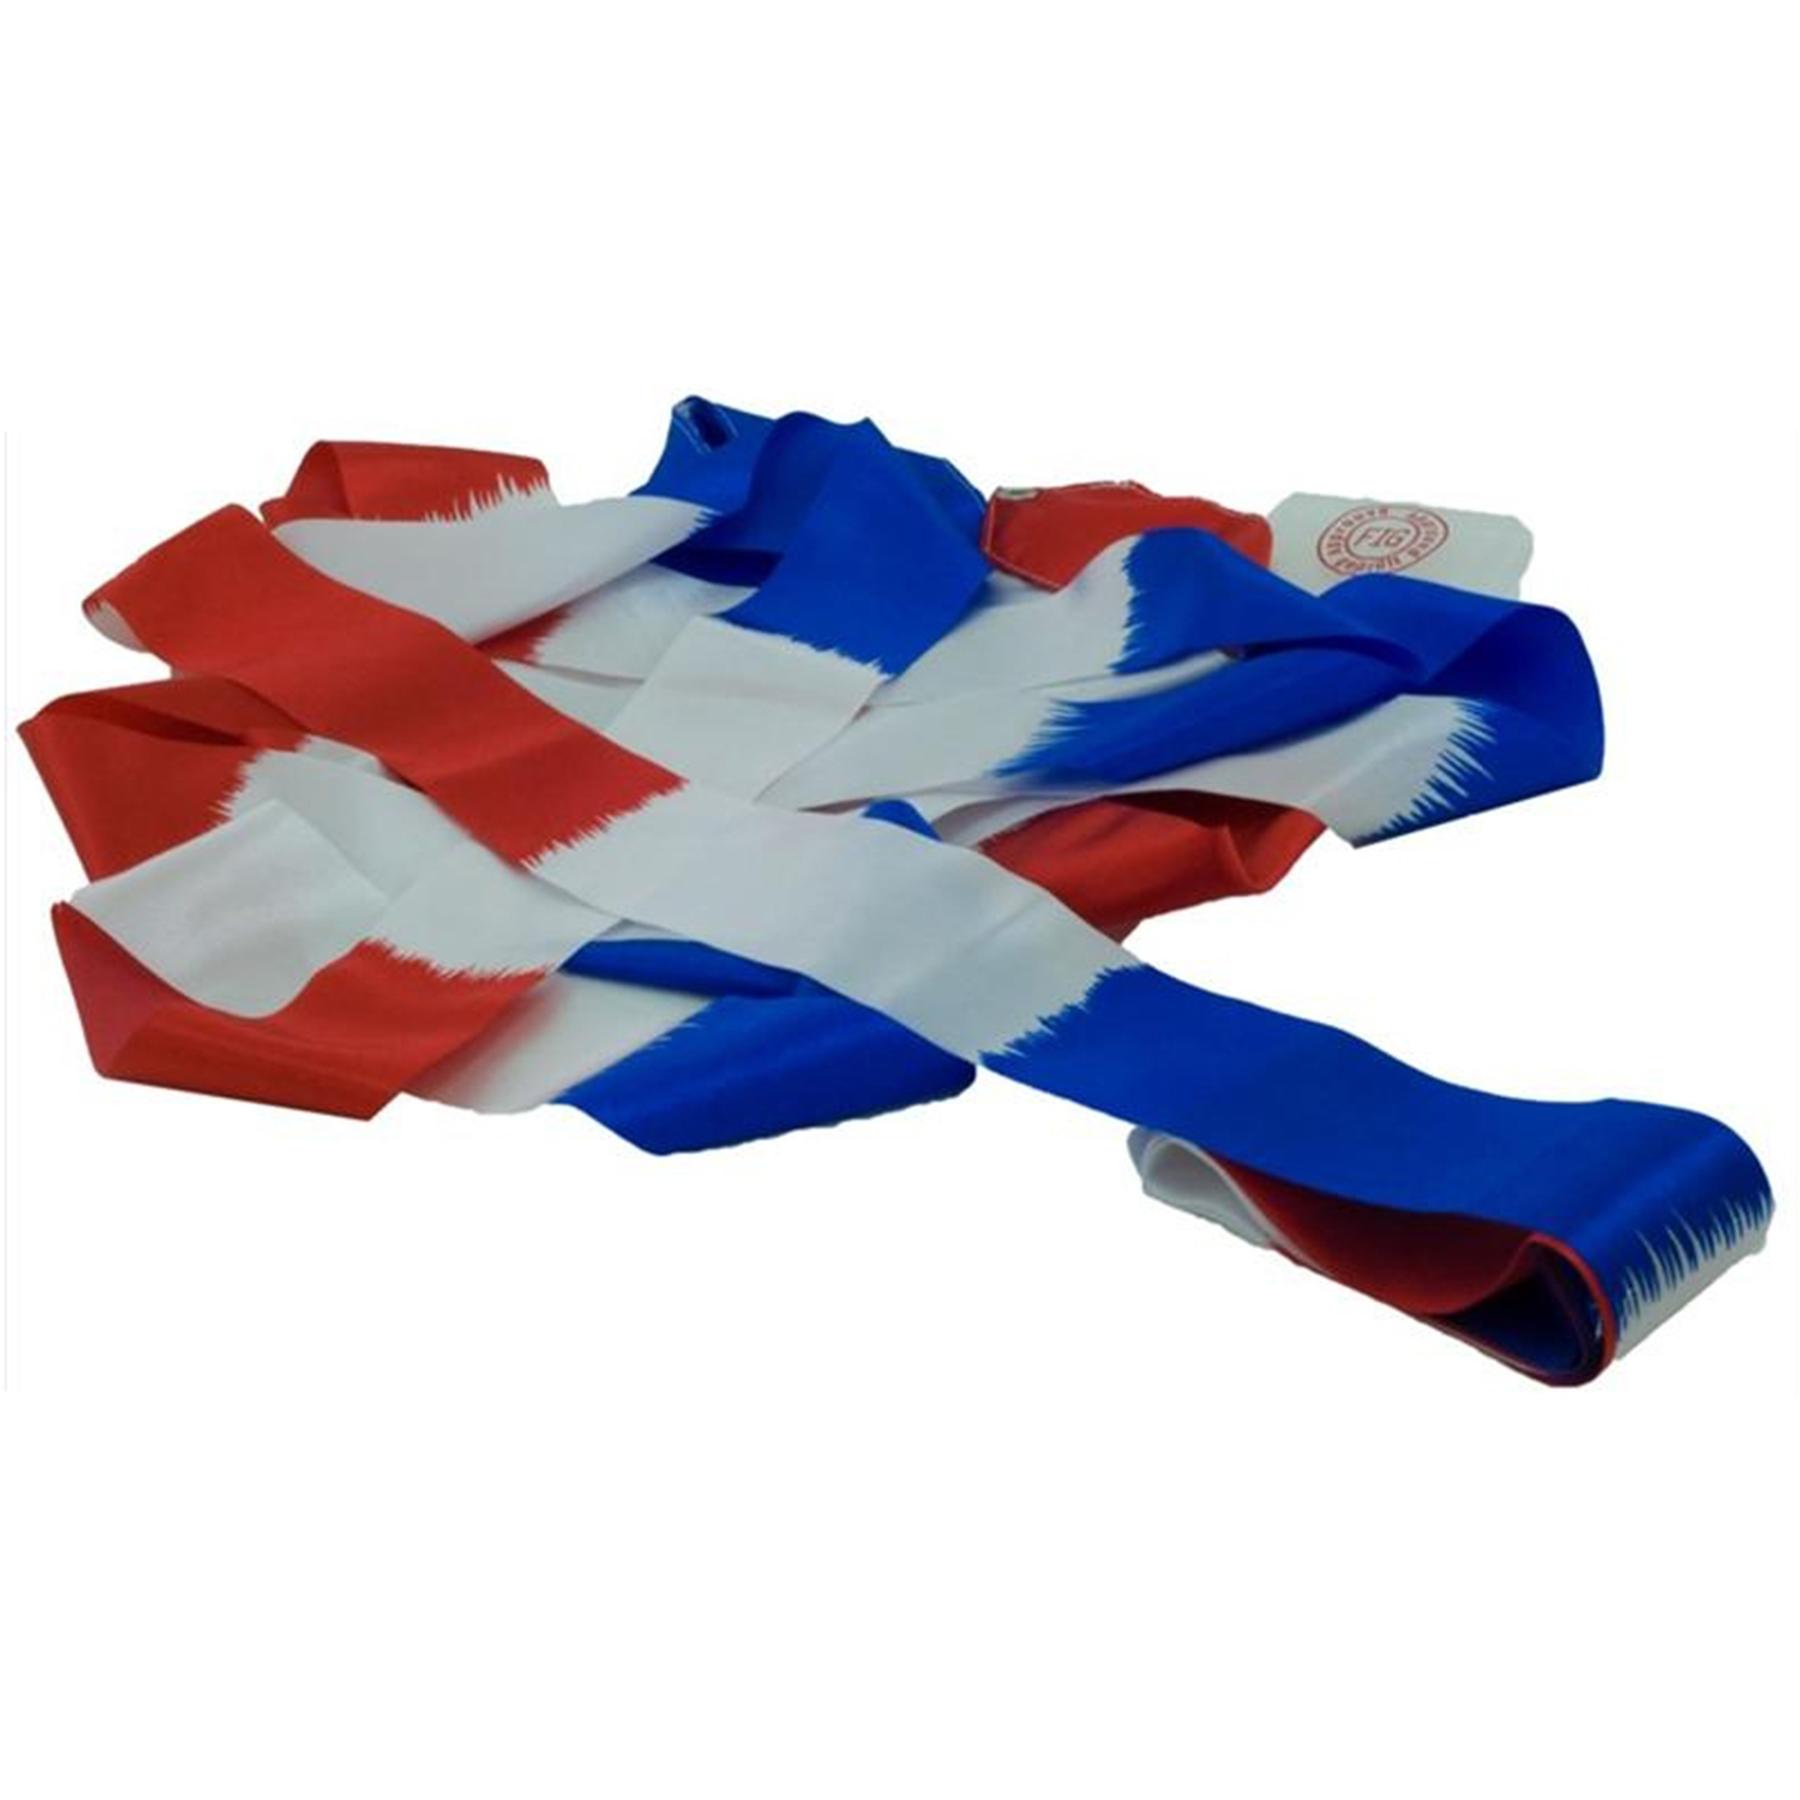 Лента гимнастическая без палочки АВ235-1-R/W/BE сине/бело/красная